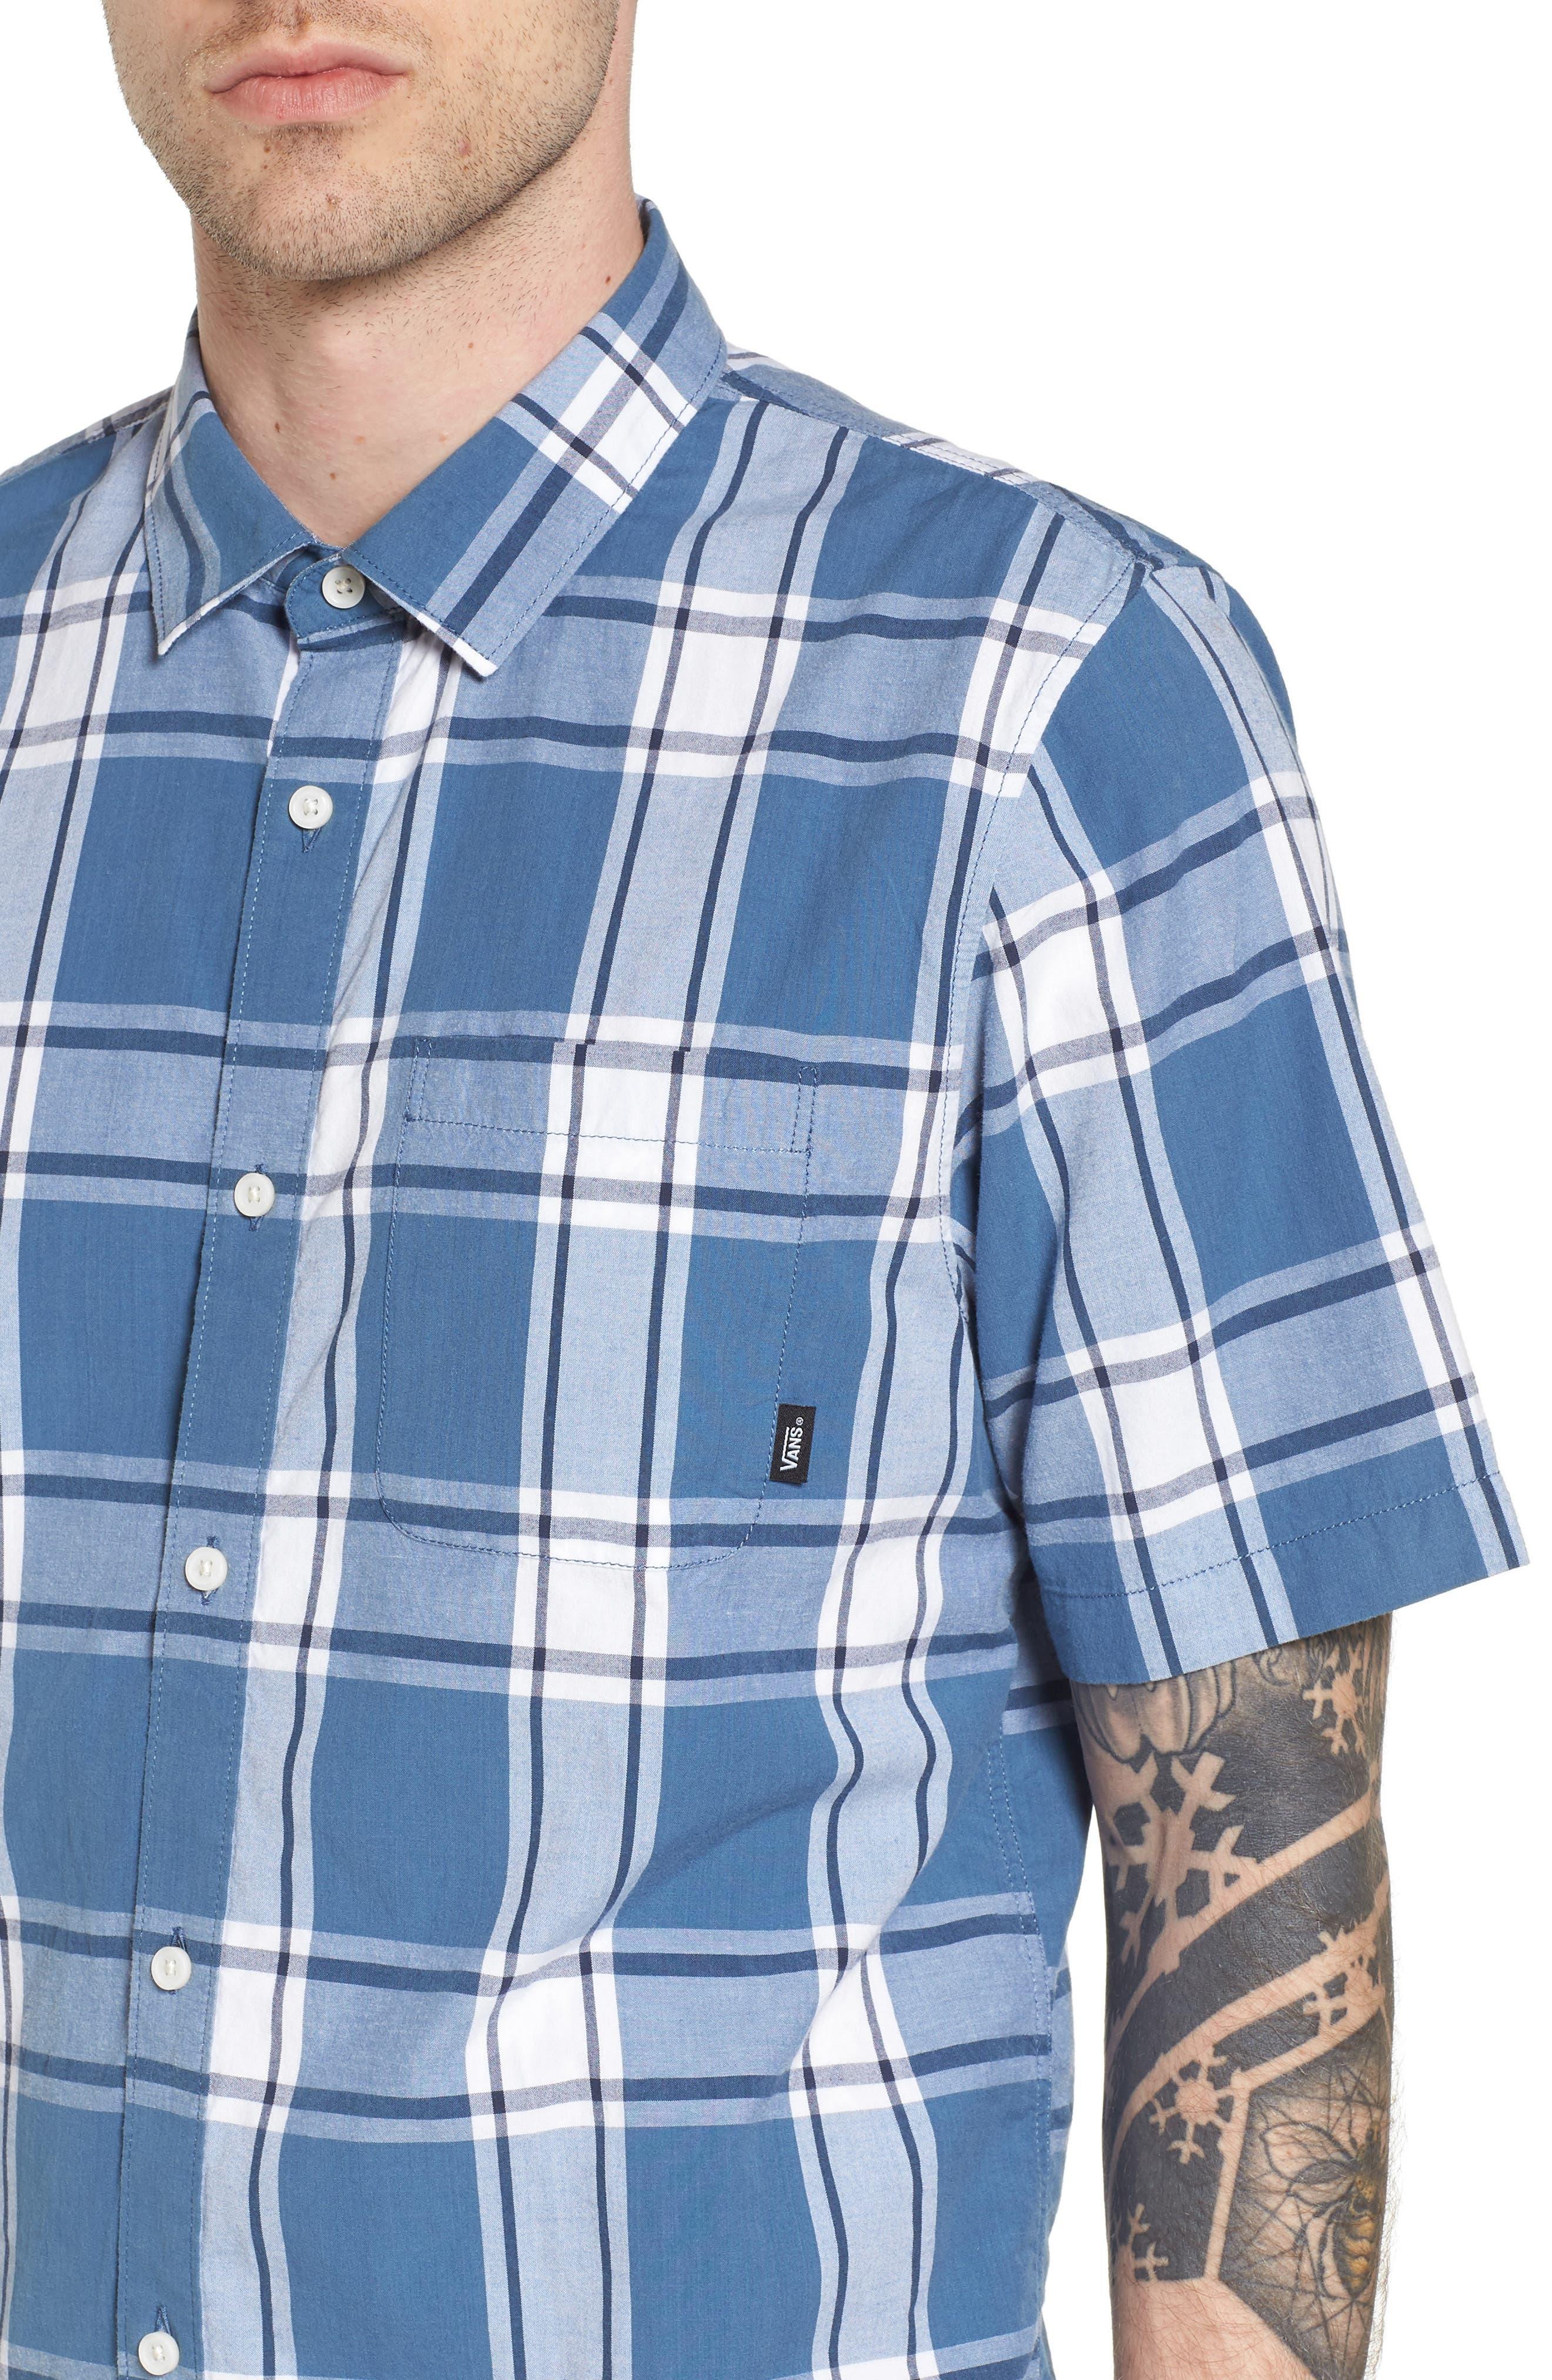 Mayfield Short Sleeve Plaid Shirt,                             Alternate thumbnail 4, color,                             420